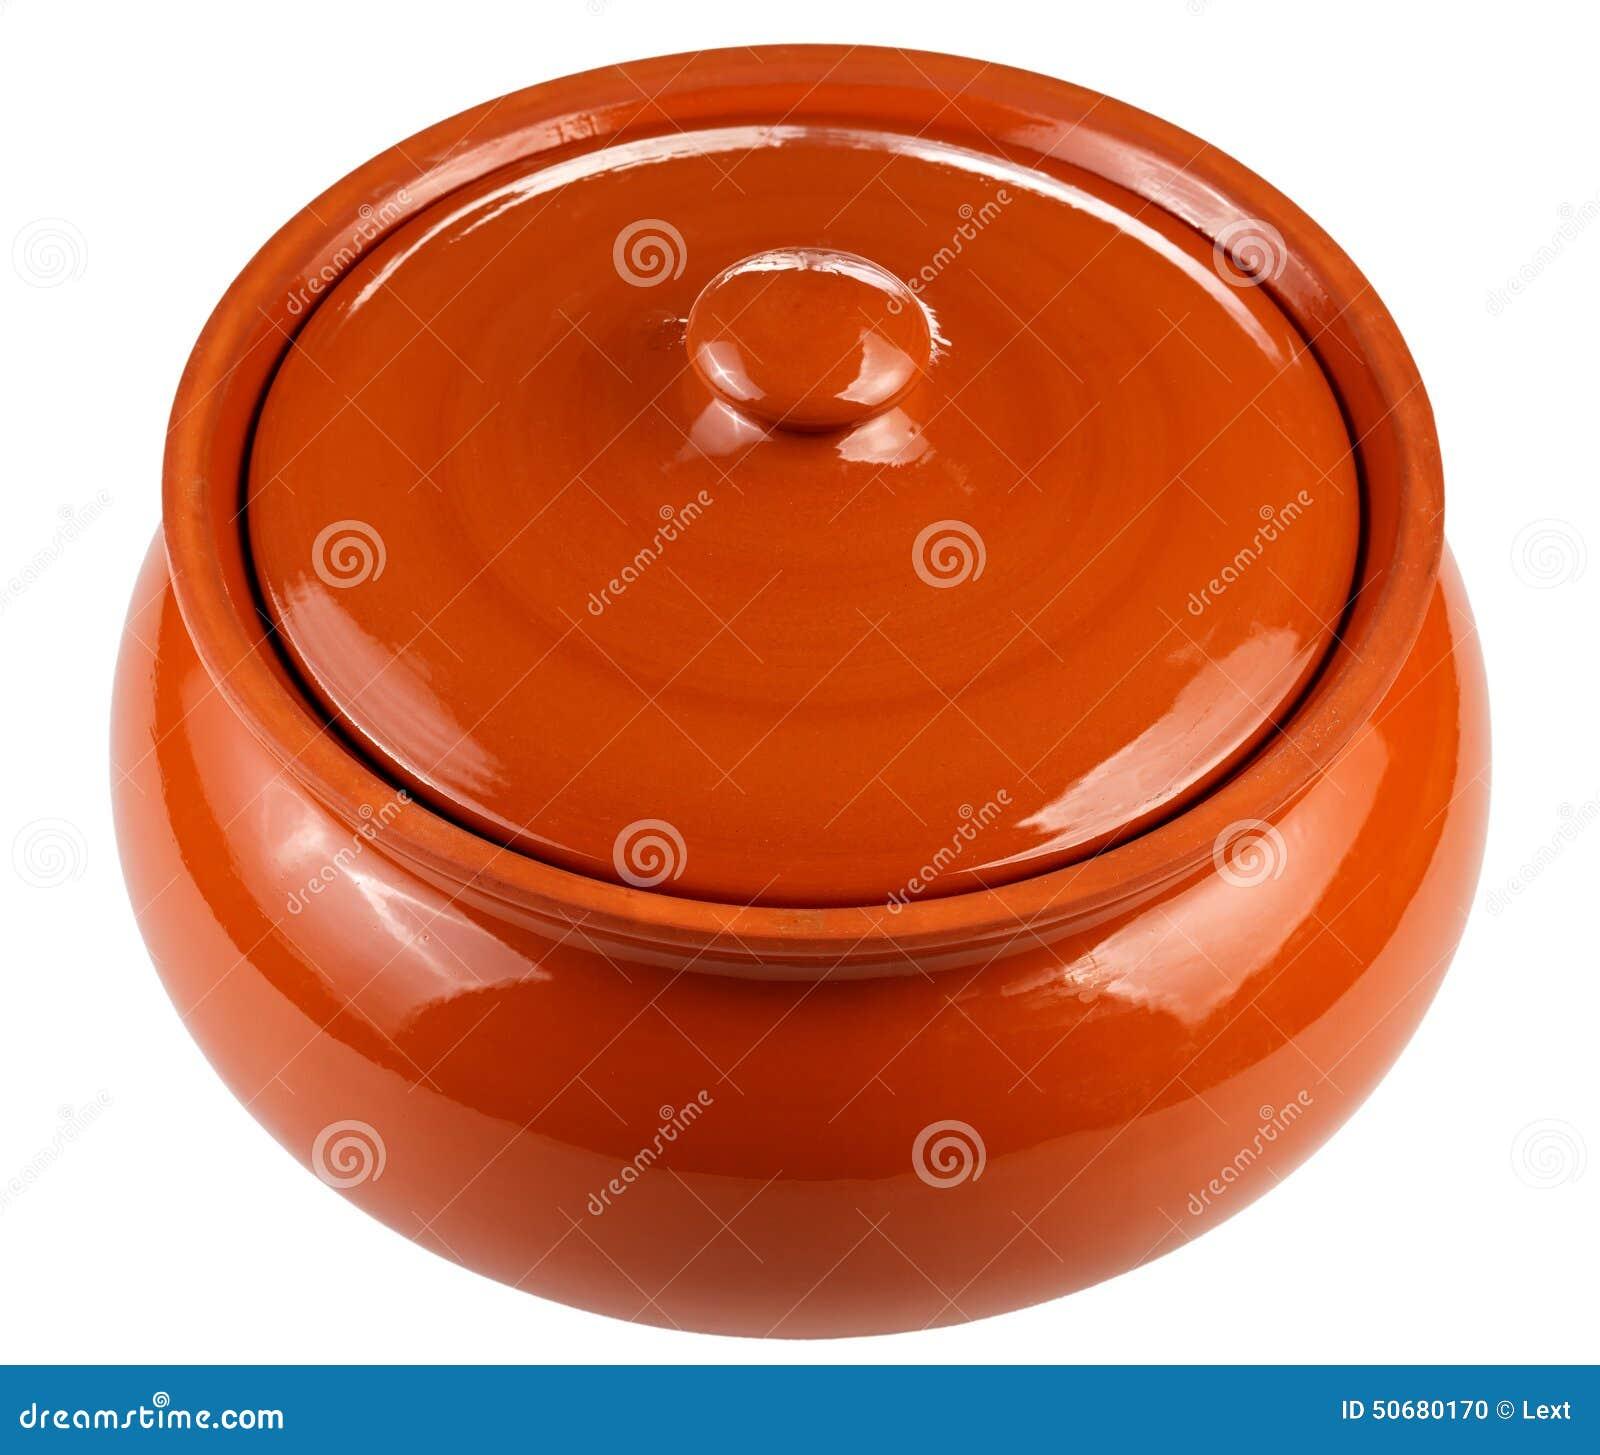 Download 烹调的泥罐 库存照片. 图片 包括有 颜色, 弯脚的, 陶器, 空白, 碗筷, 点心, 手工制造, 黏土 - 50680170